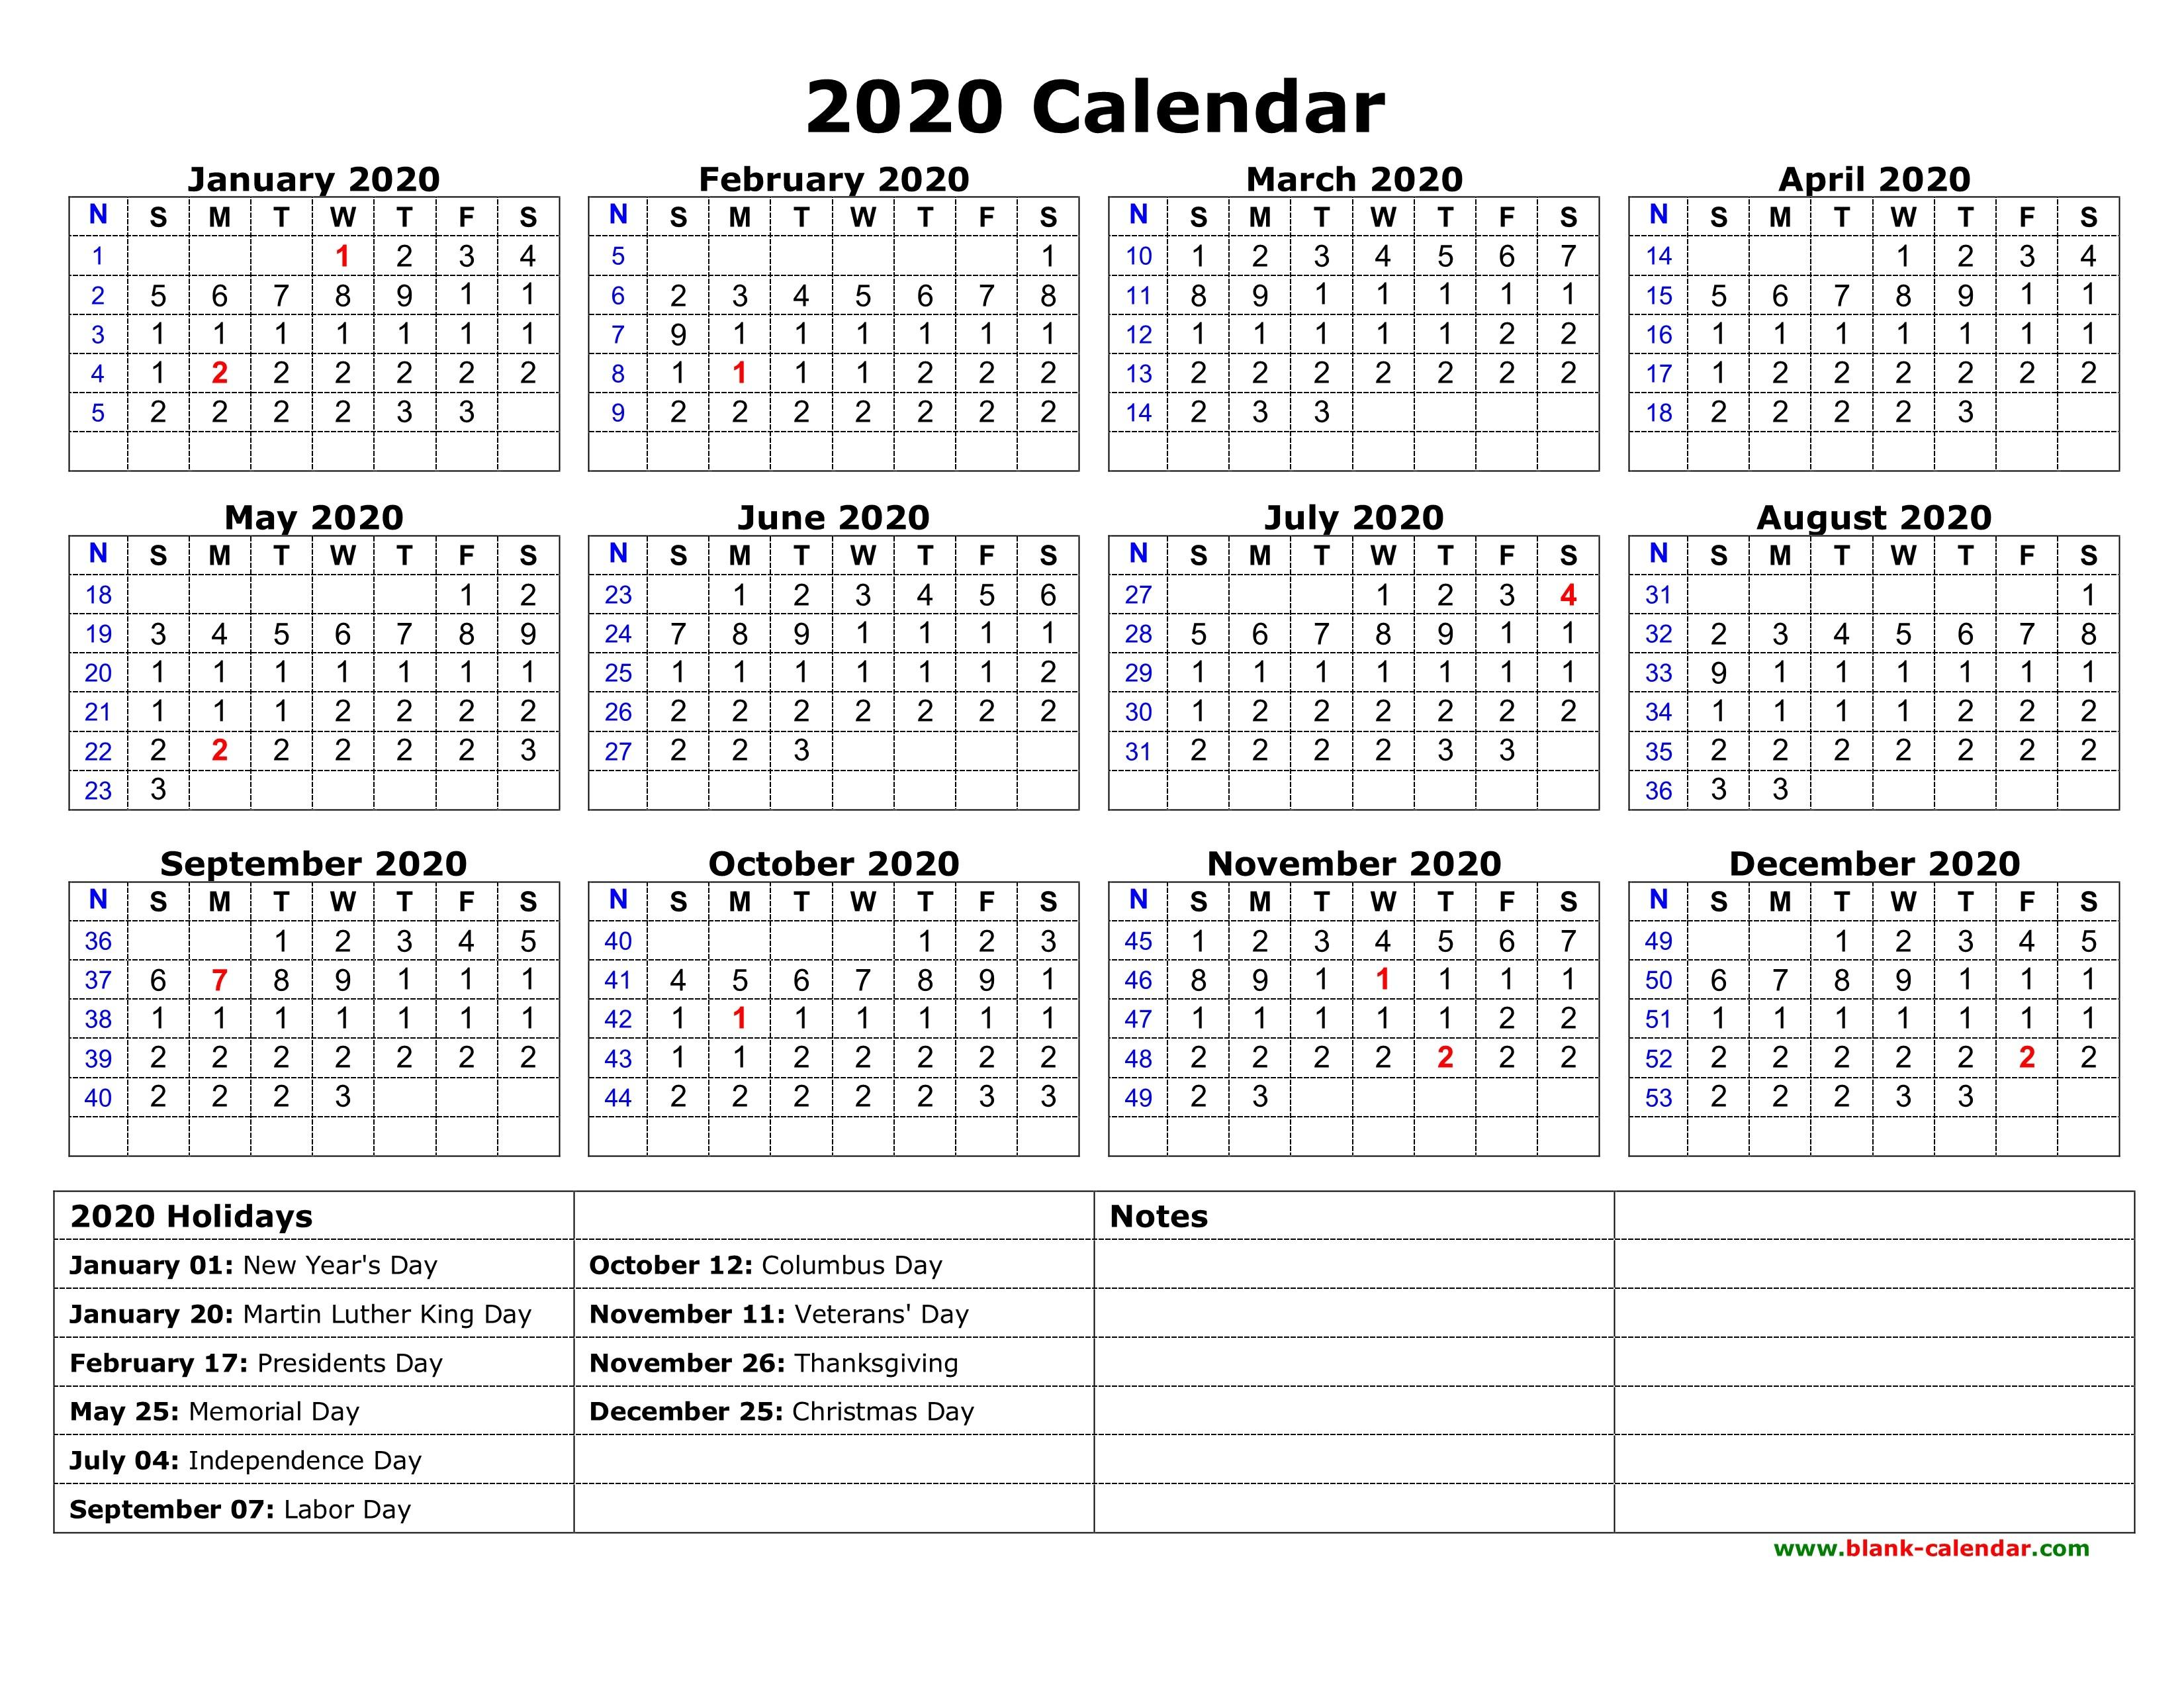 Free Printable 2020 Calendar With Holidays 2 - Crearphpnuke with 2020 Free Printable Coloring Calendar